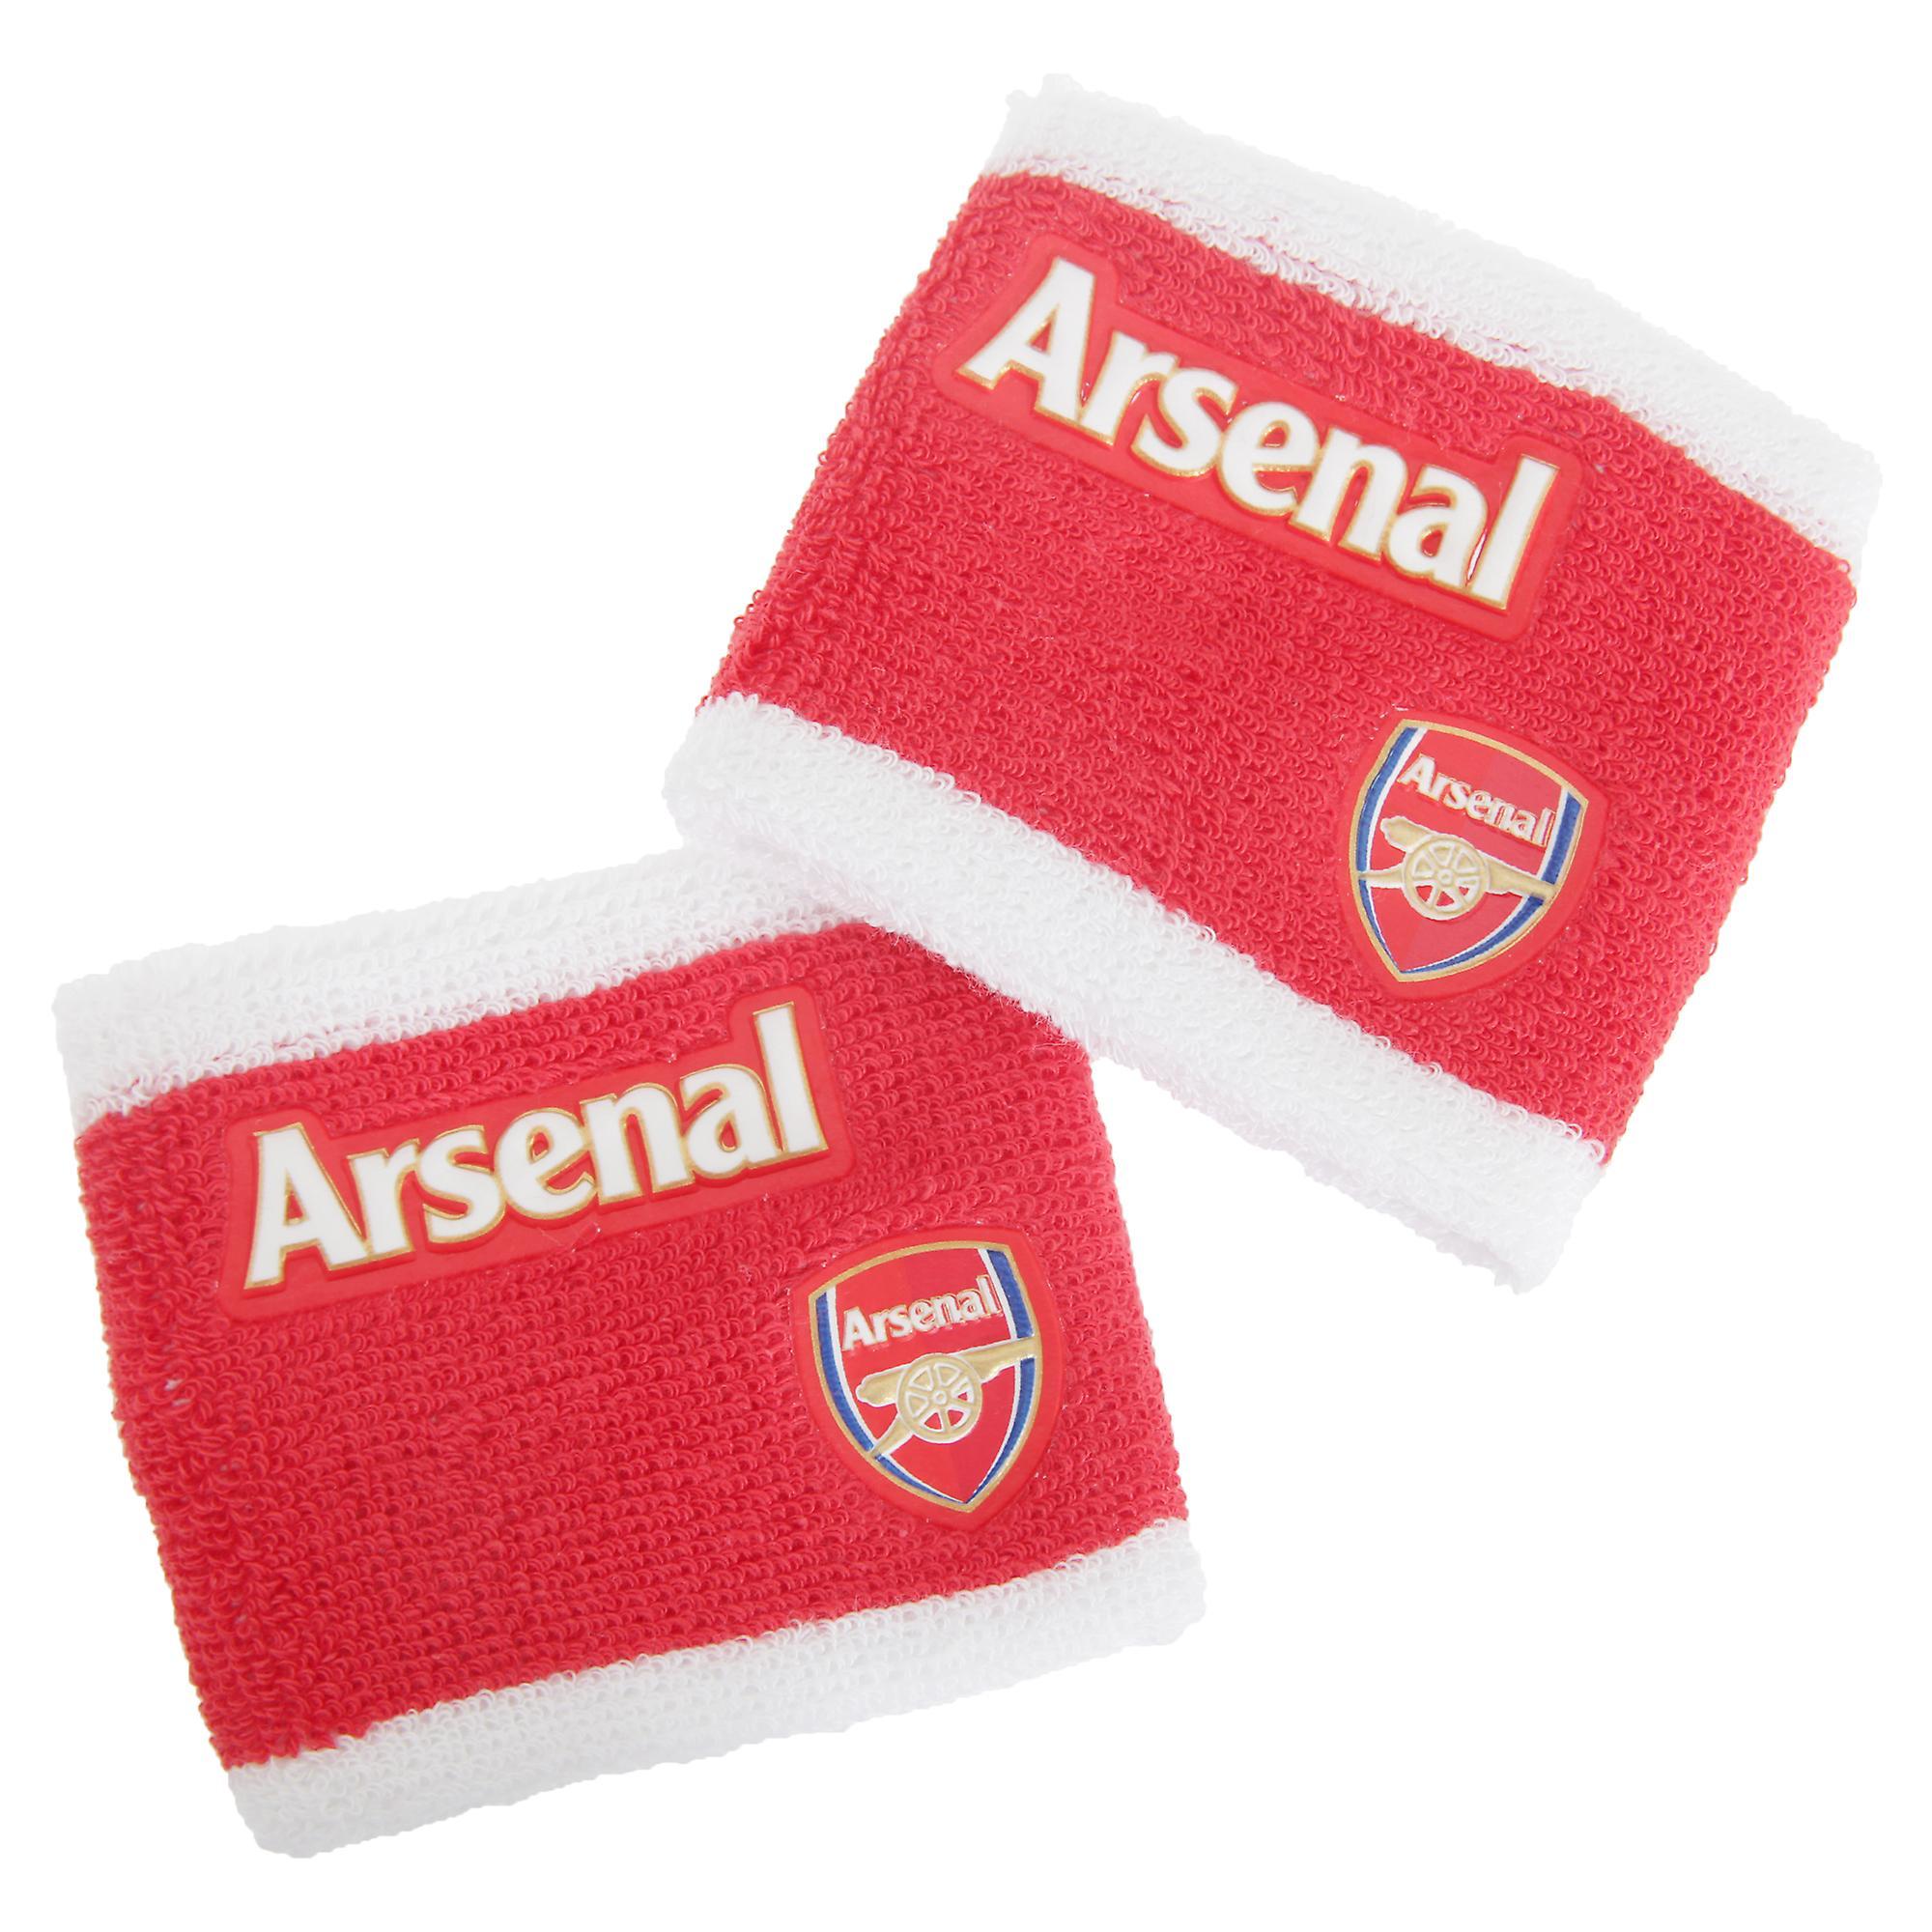 Arsenal FC officiële 2 Tone Athletic Football Crest Sport polsbandjes (Pack van 2)